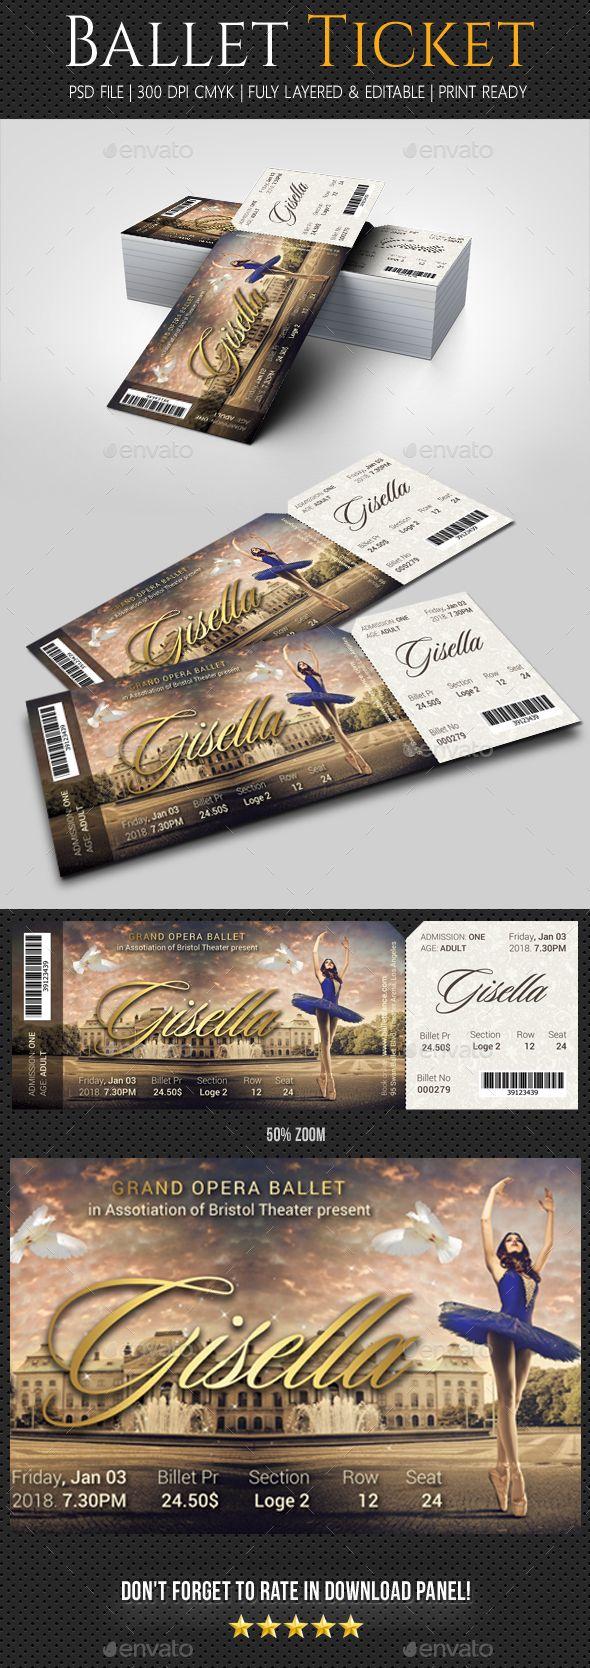 Ballet ticket